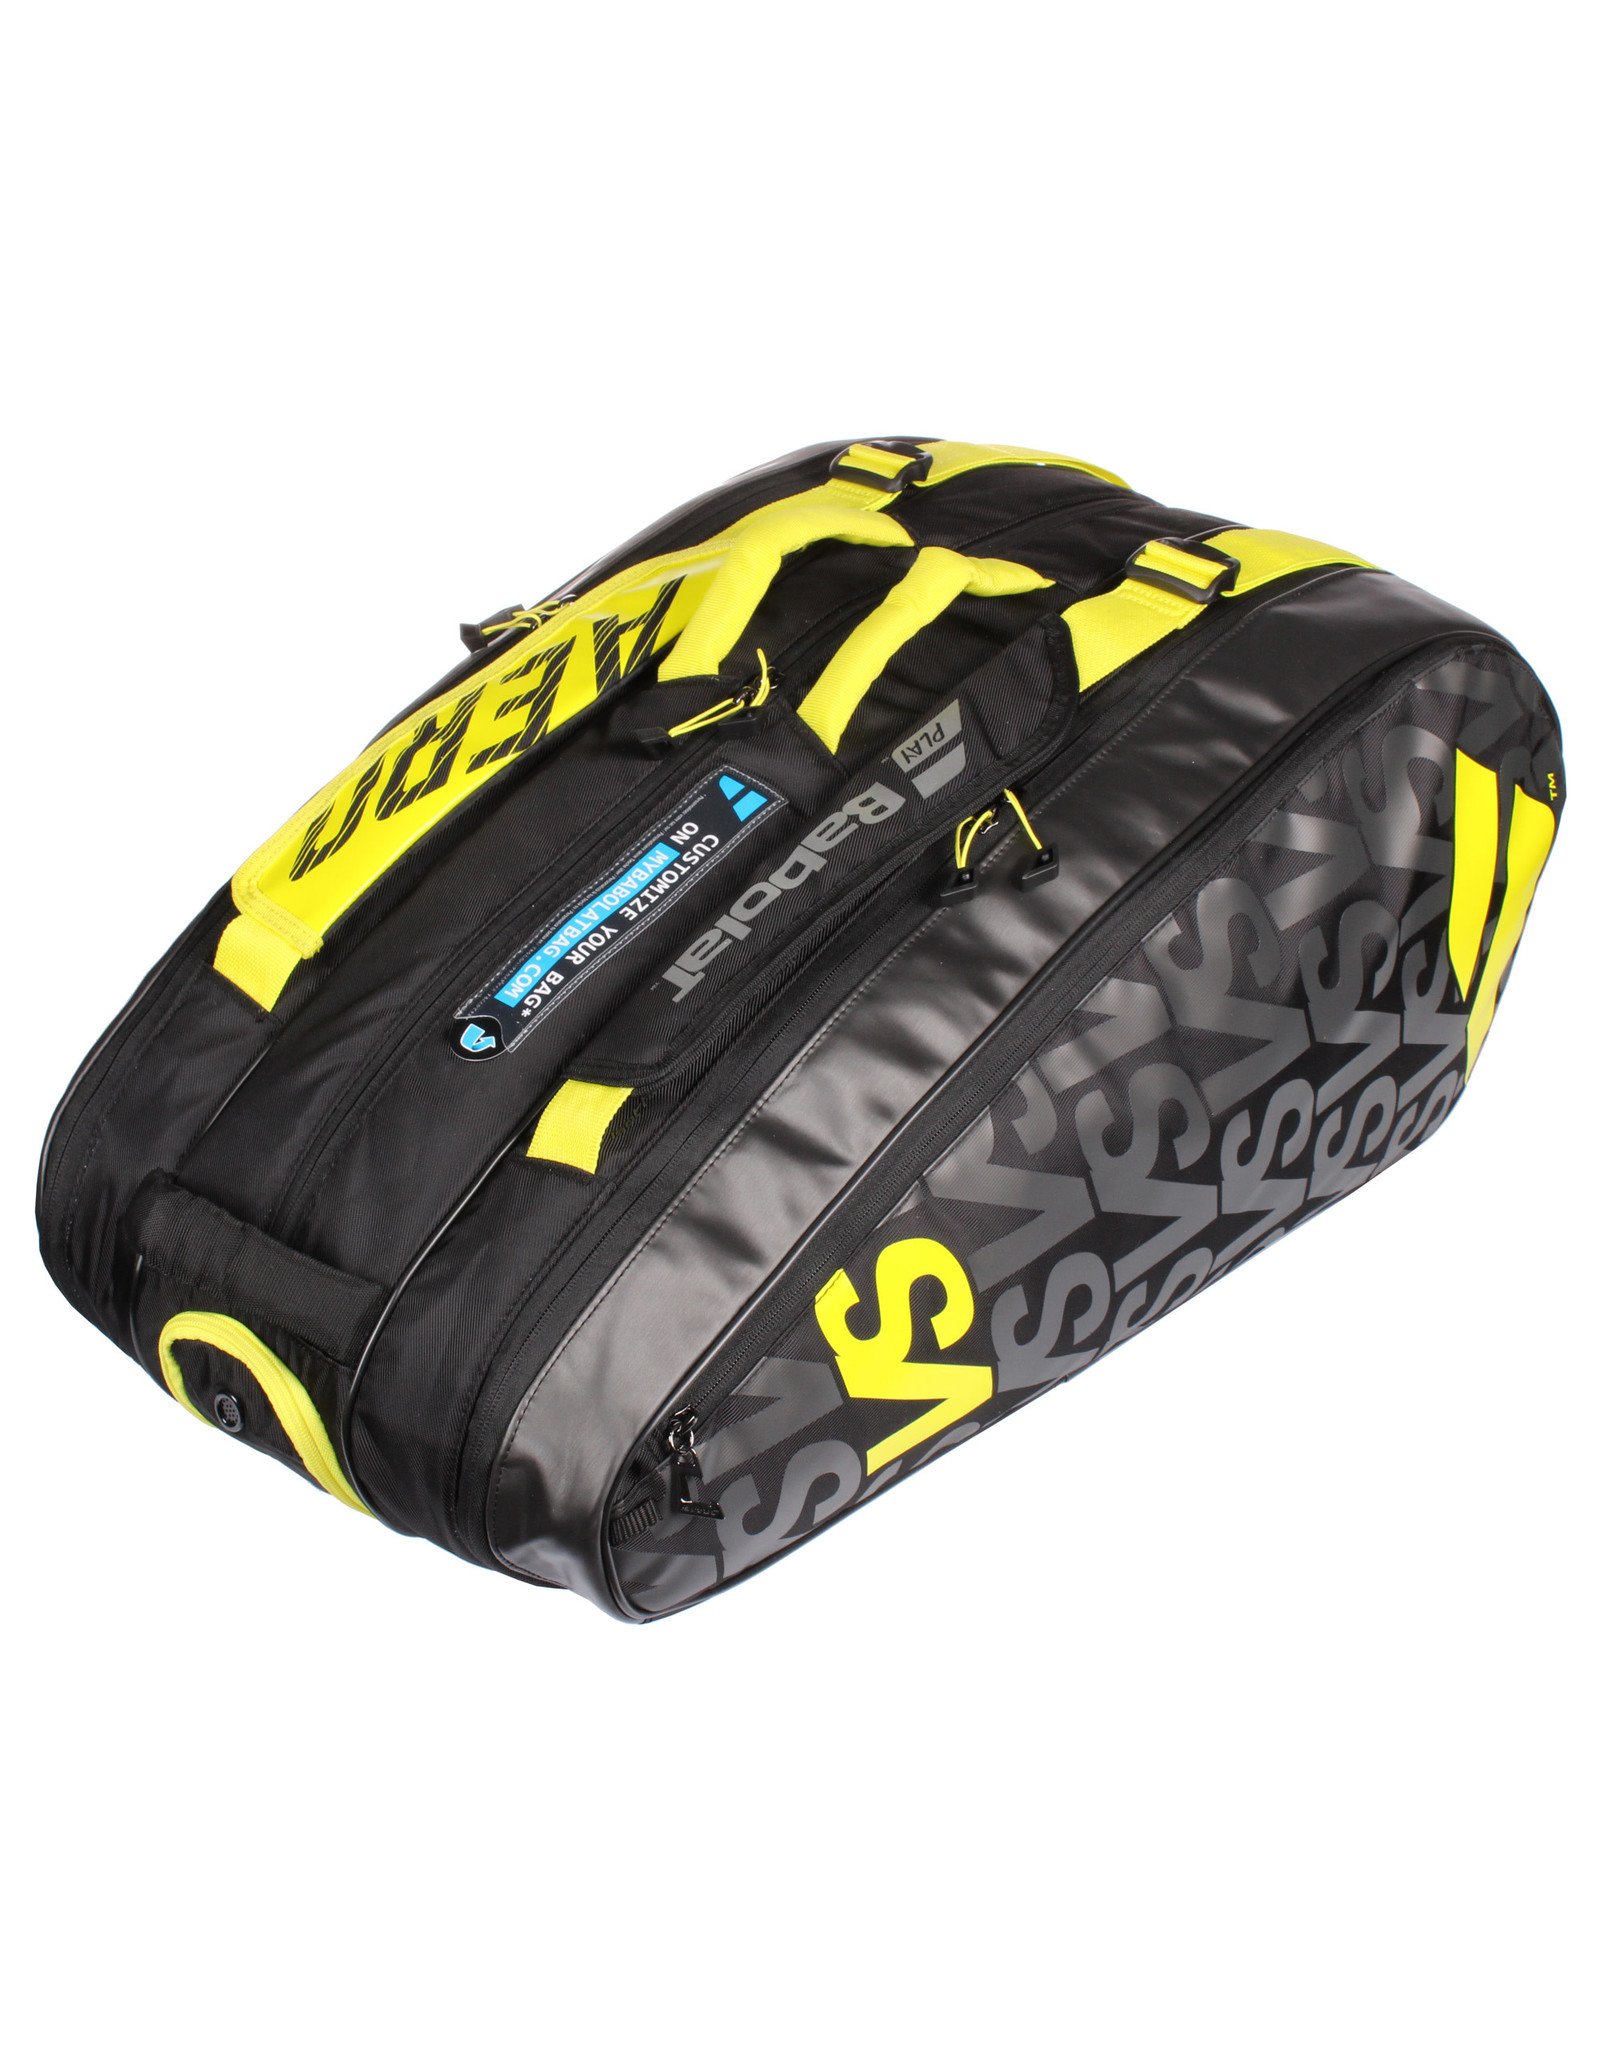 Babolat Babolat Pure Aero VS 9 Pack Tennis Bag Black and Yellow